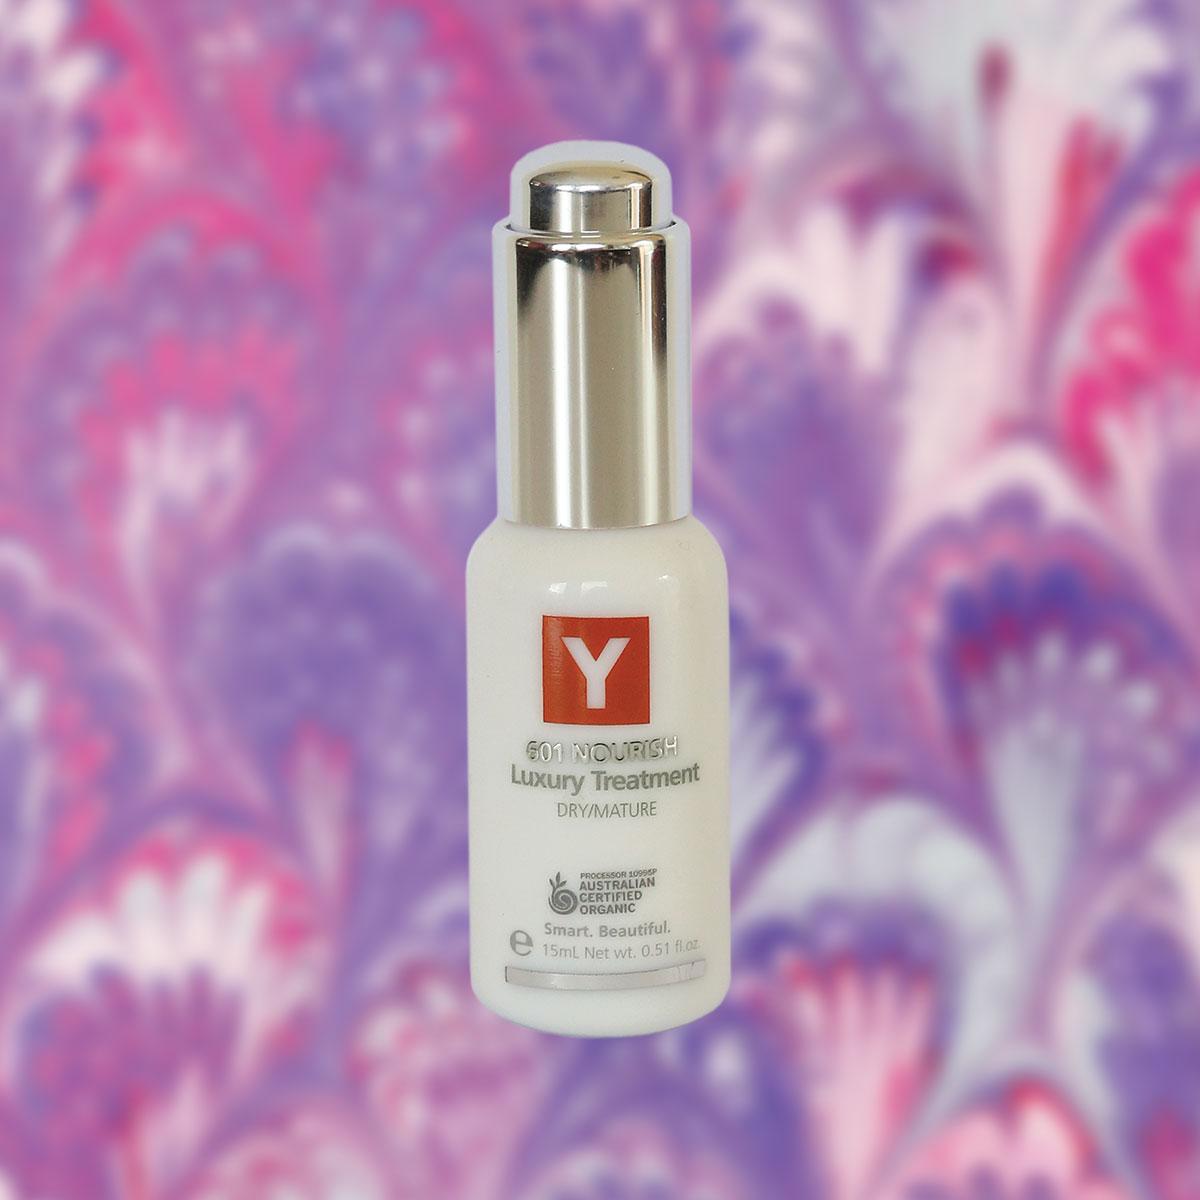 601 organic skin care dry skin